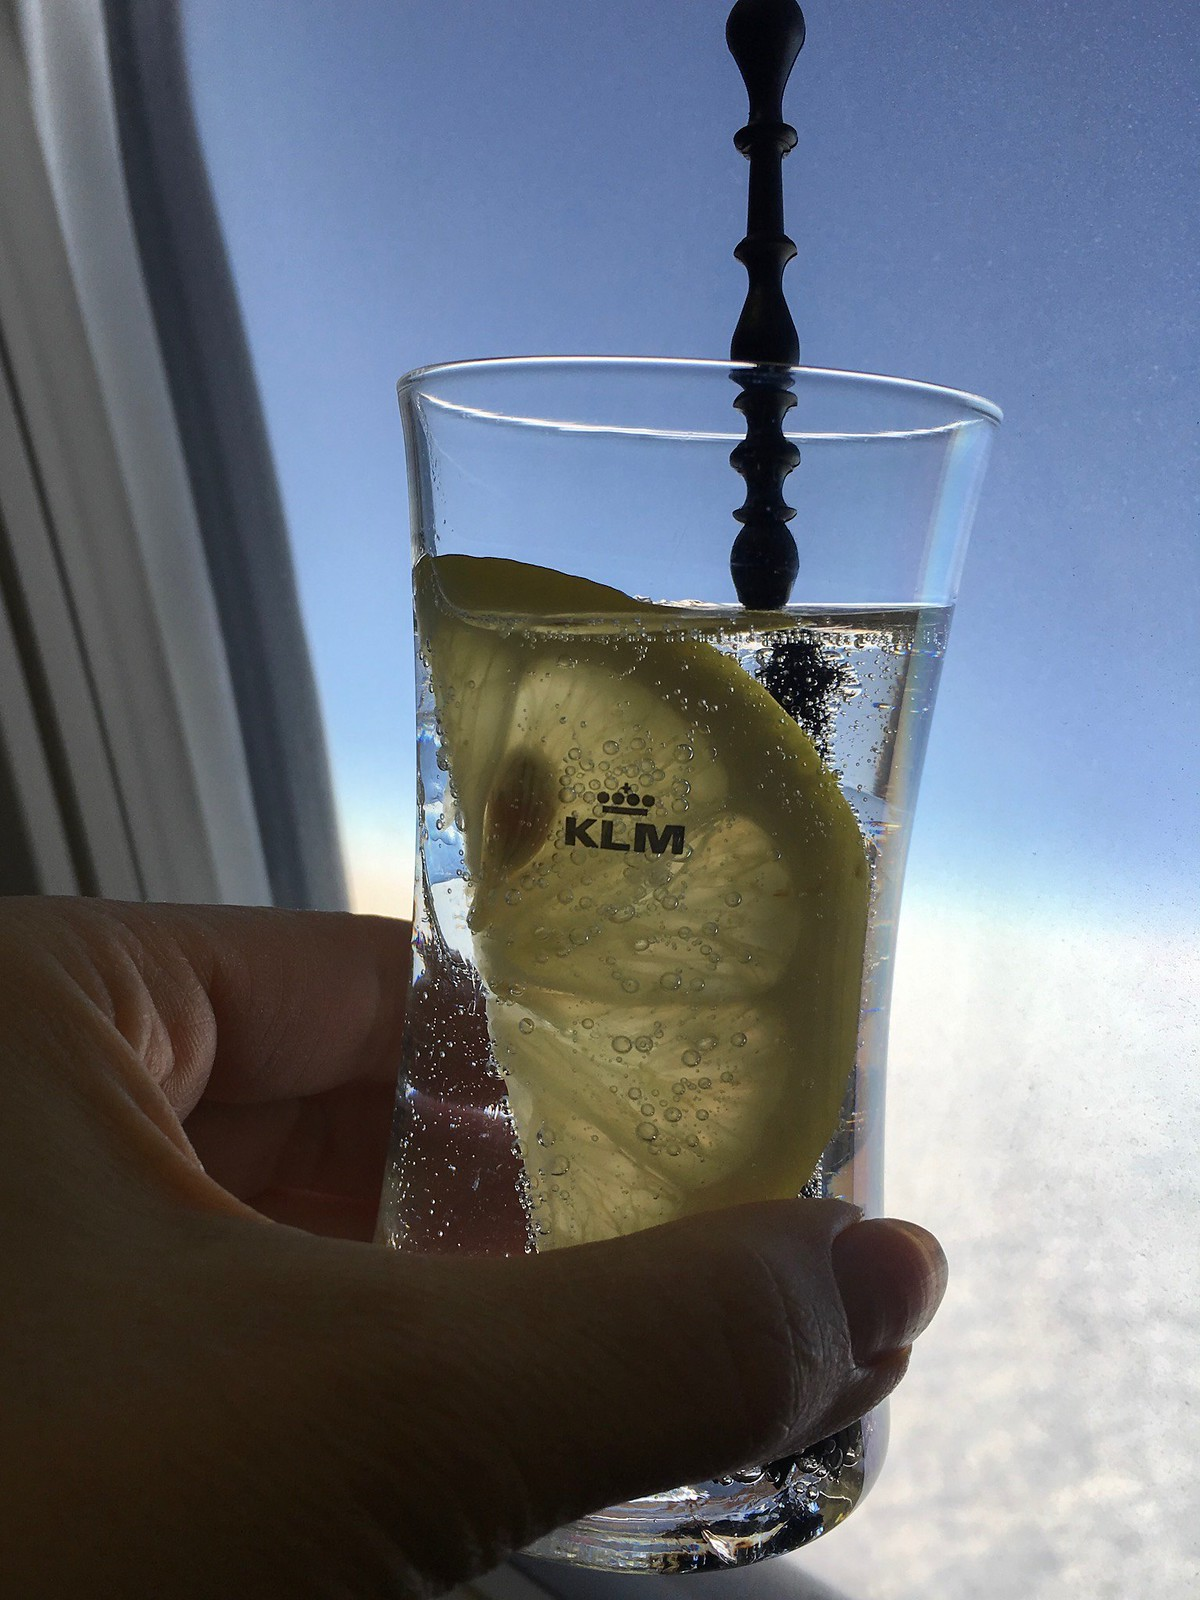 KLM business